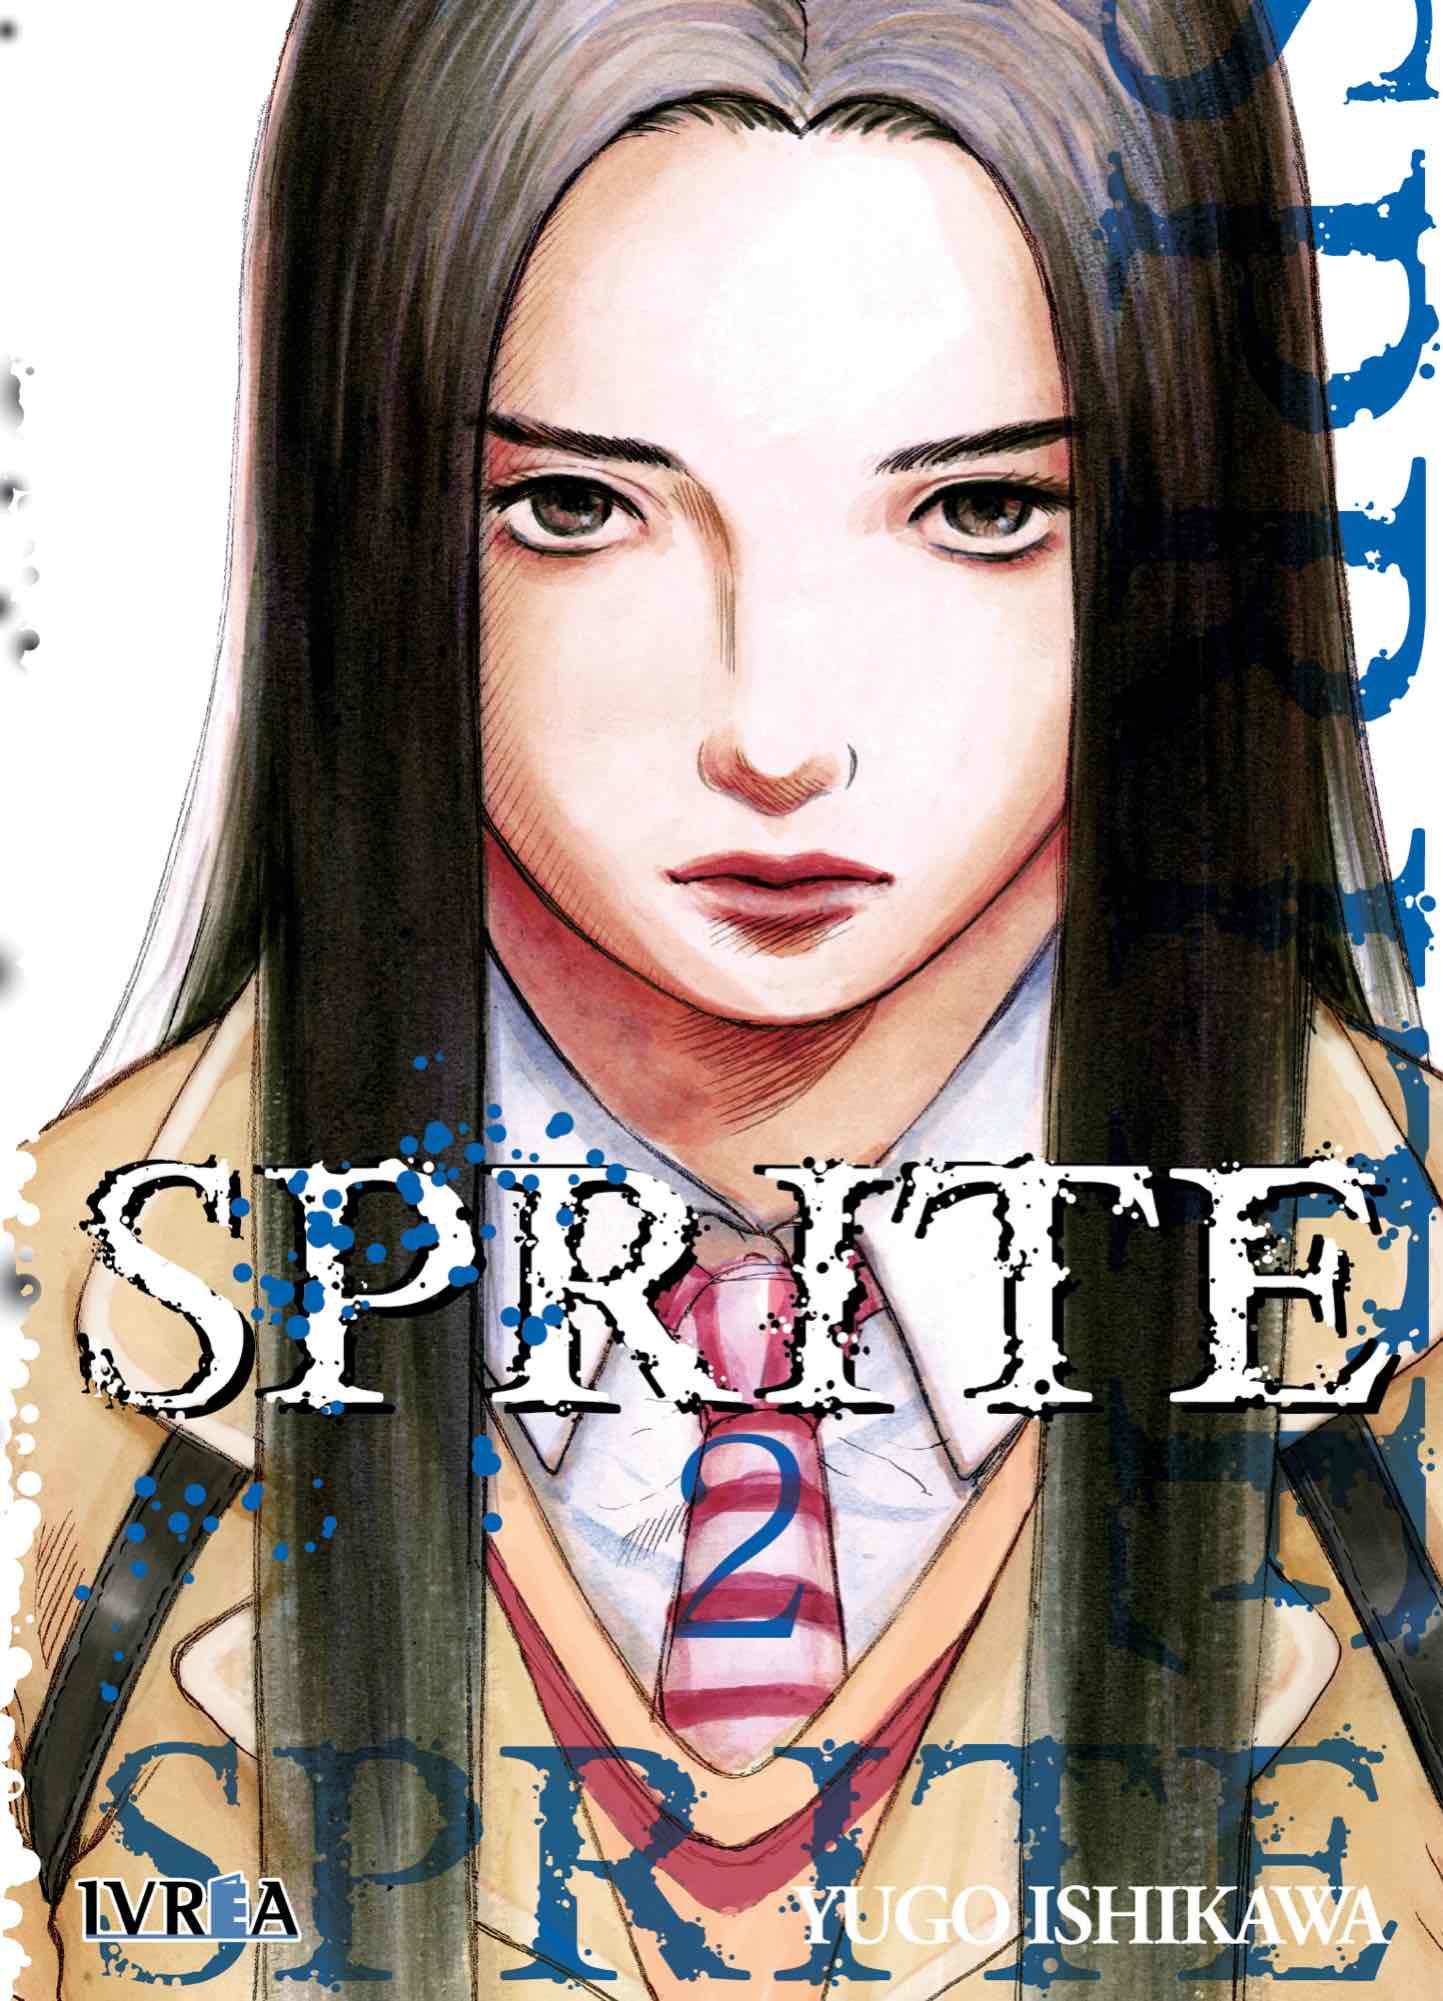 SPRITE 02 (COMIC)